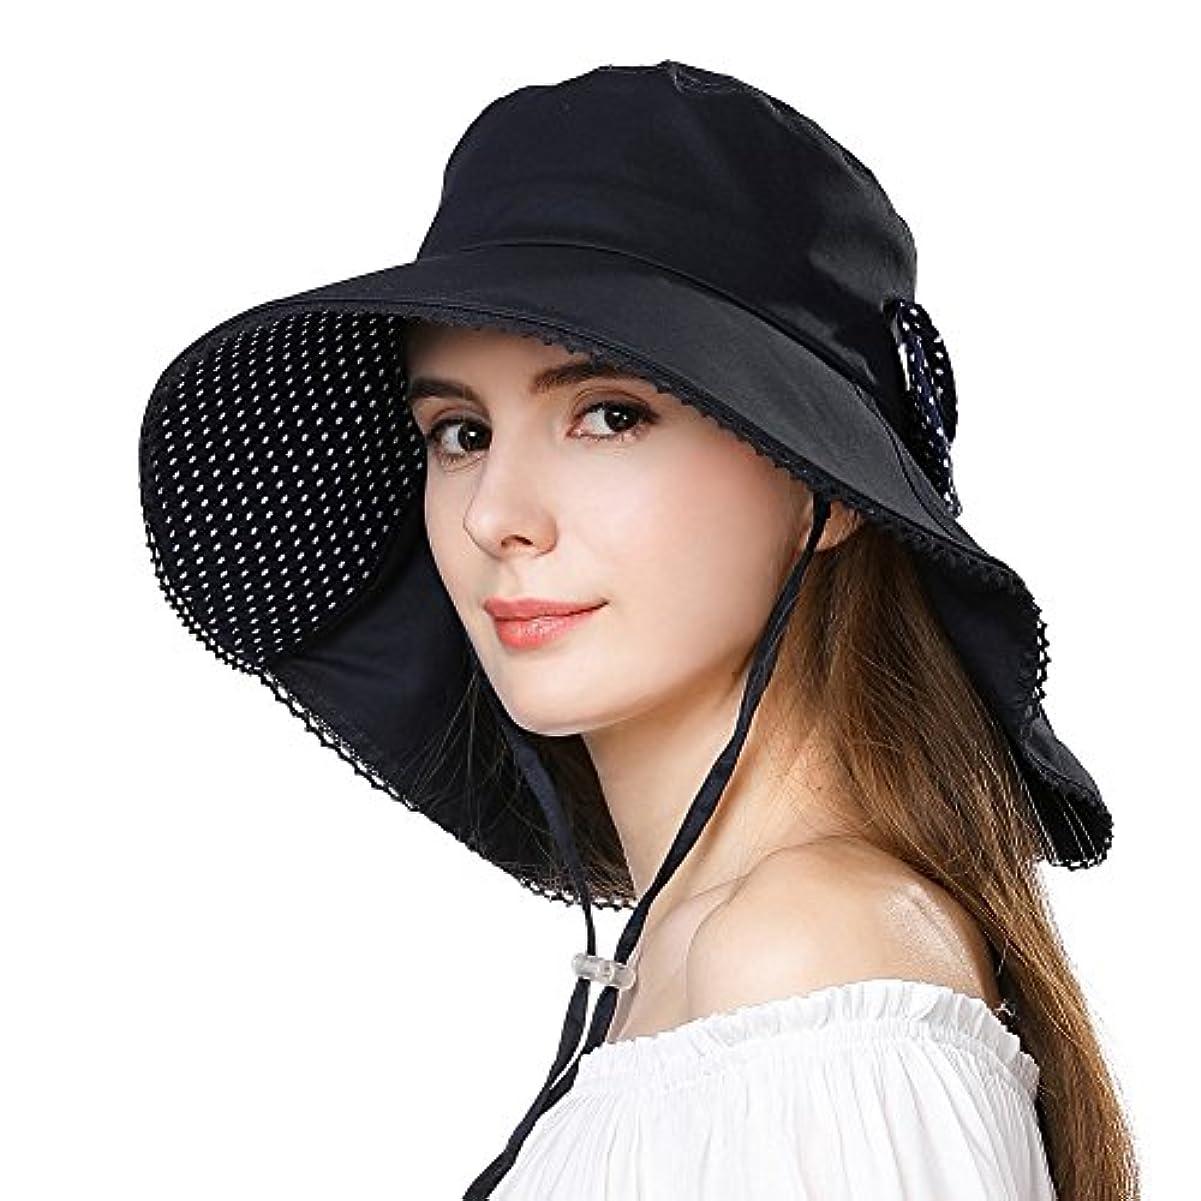 fancet Packable Sun Hat for Womenハイキングサファリガーデニングビーチアクセサリー釣りSPF